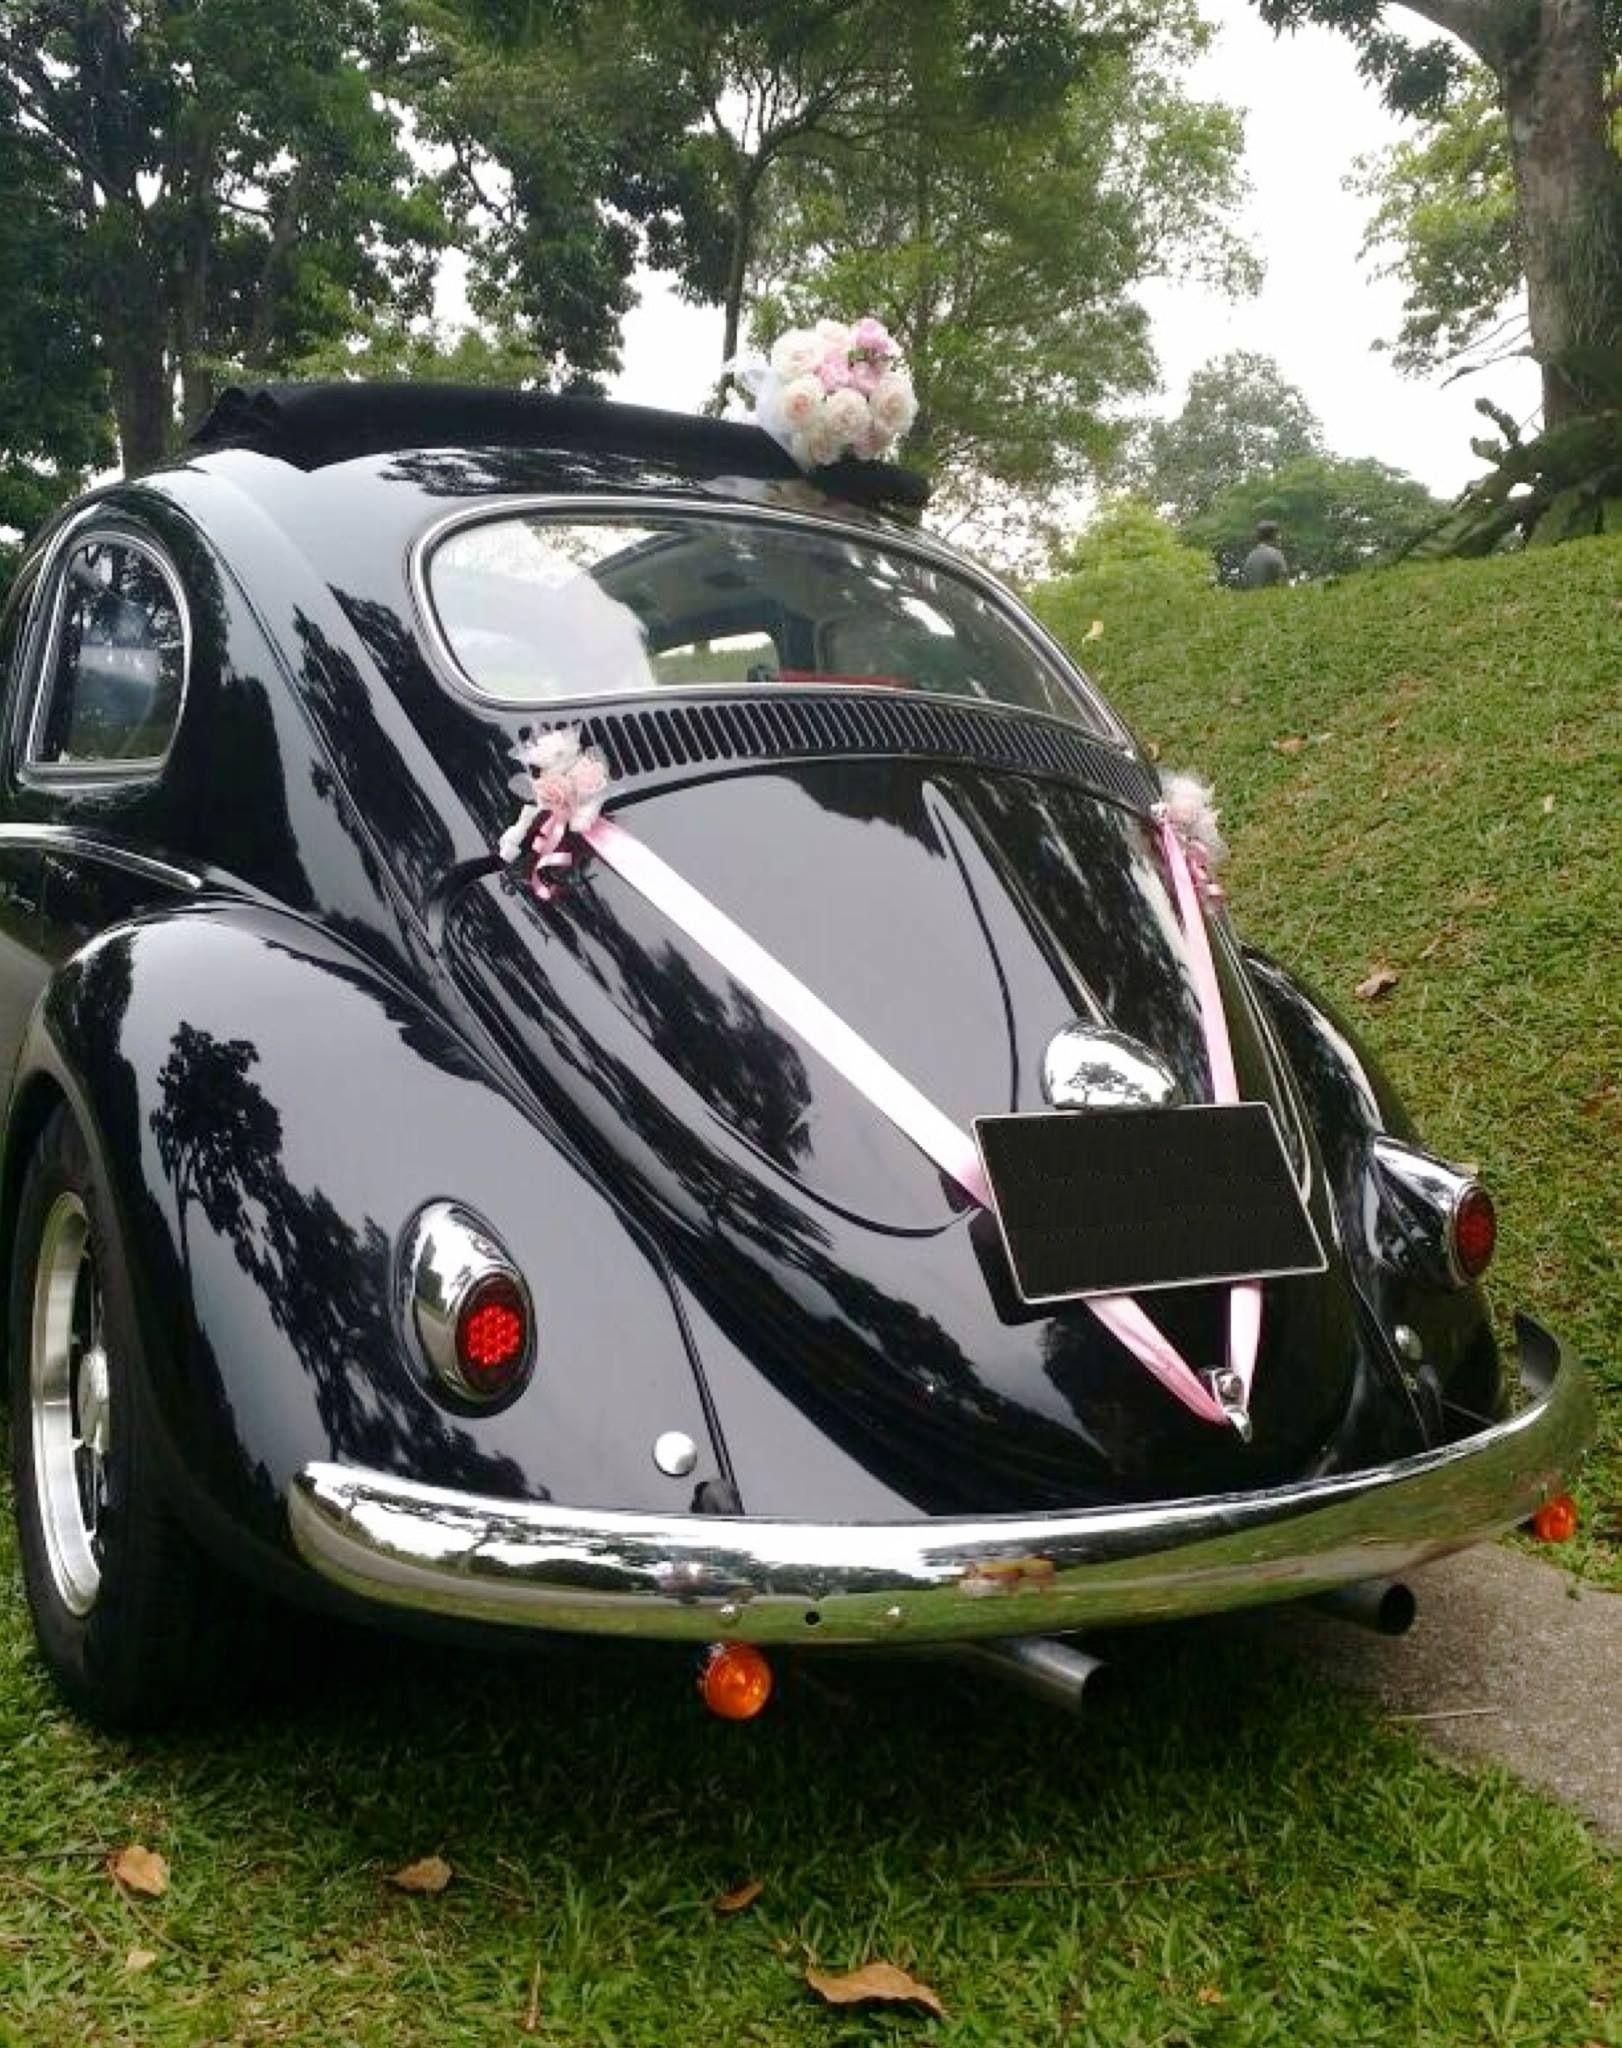 Thats all volks wedding beetle hire singapore 1959 vw beetle thats all volks wedding beetle hire singapore 1959 vw beetle vintage wedding car rental singapore vw beetle bridal car decoration junglespirit Choice Image